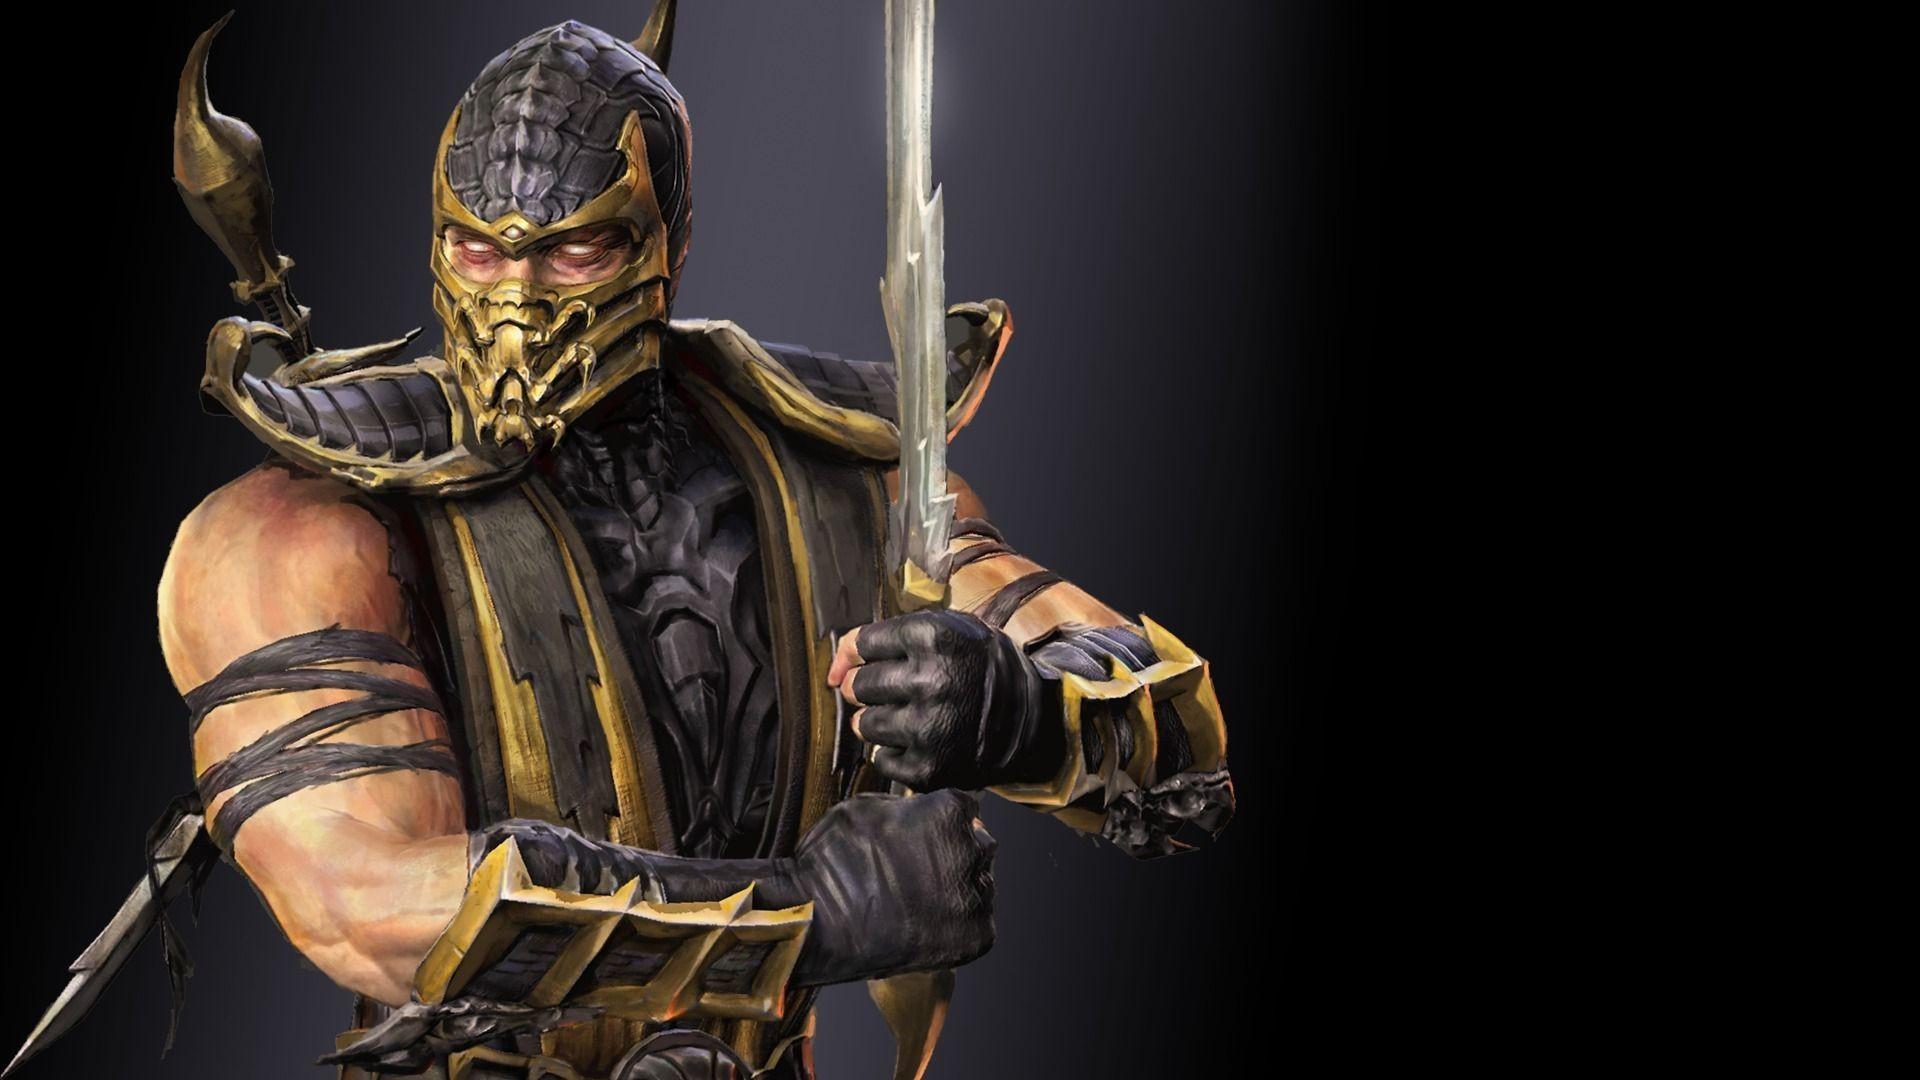 Mortal Kombat 9 Scorpion Wallpaper 63 Pictures